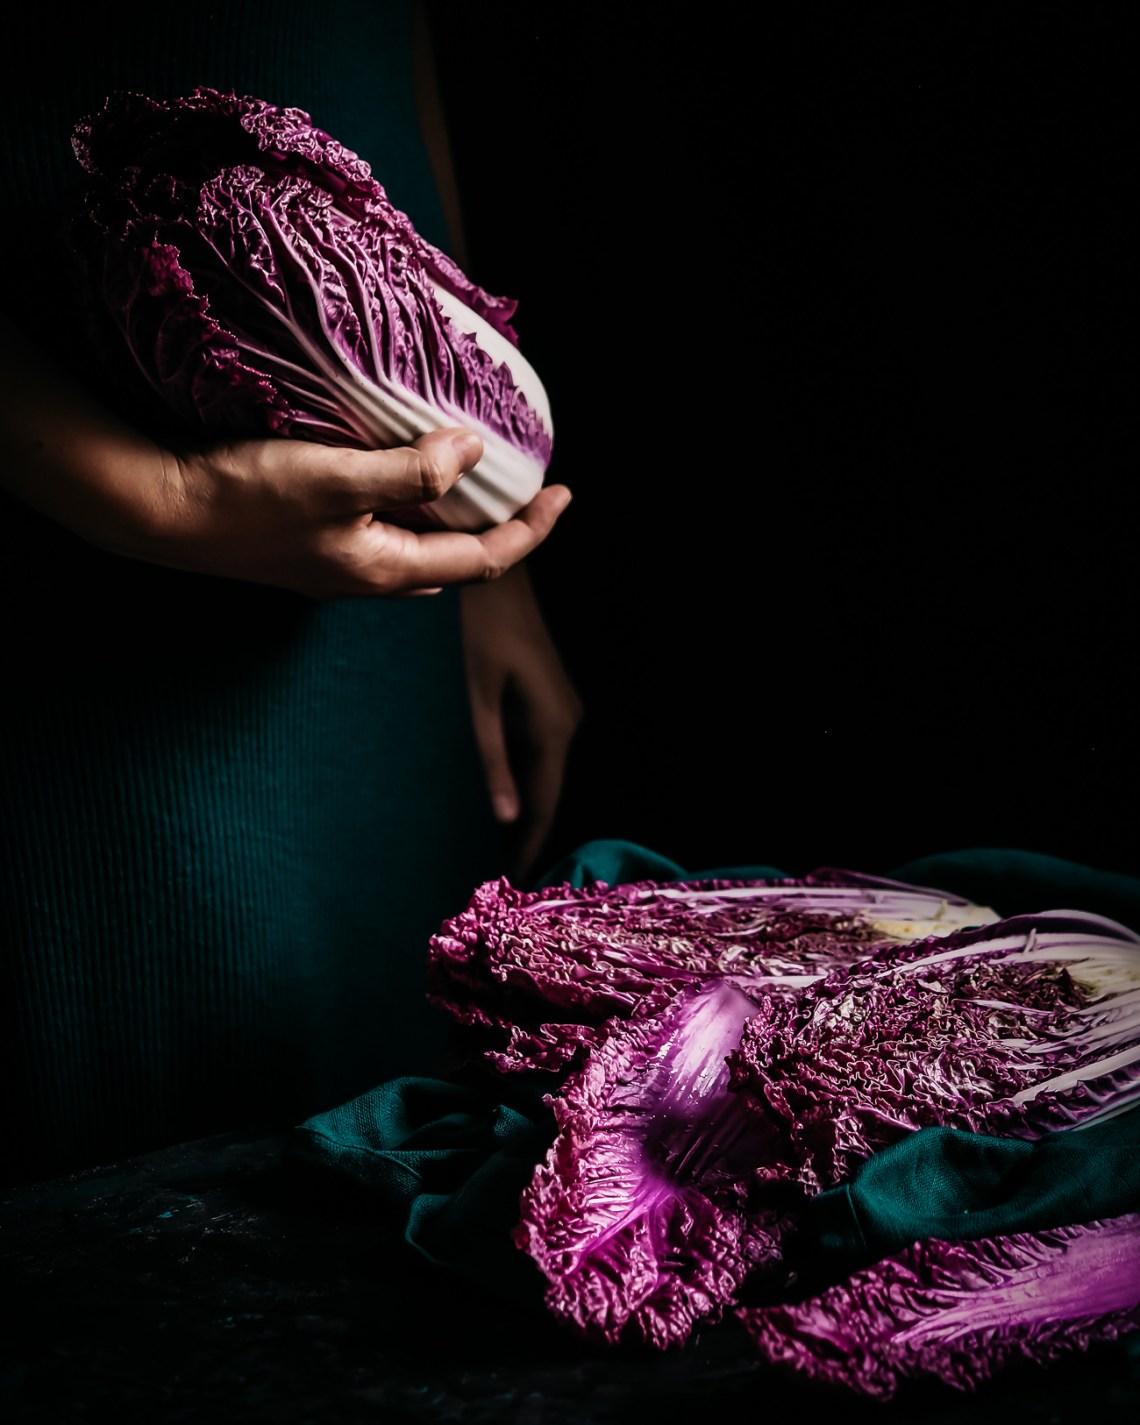 violetti kiinankaali